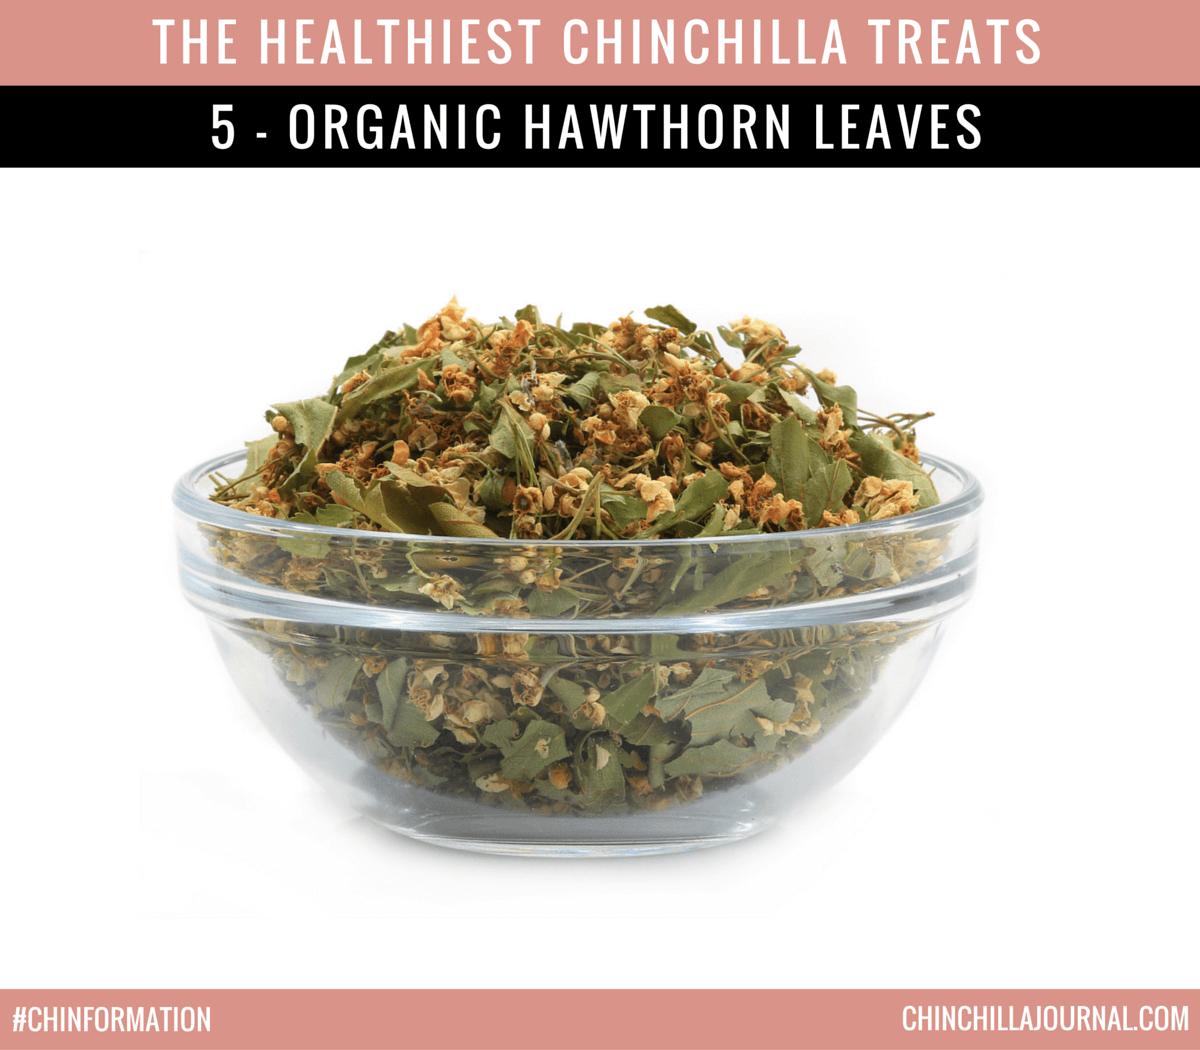 The Healthiest Chinchilla Treats - 5 - Organic Hawthorn Leaves